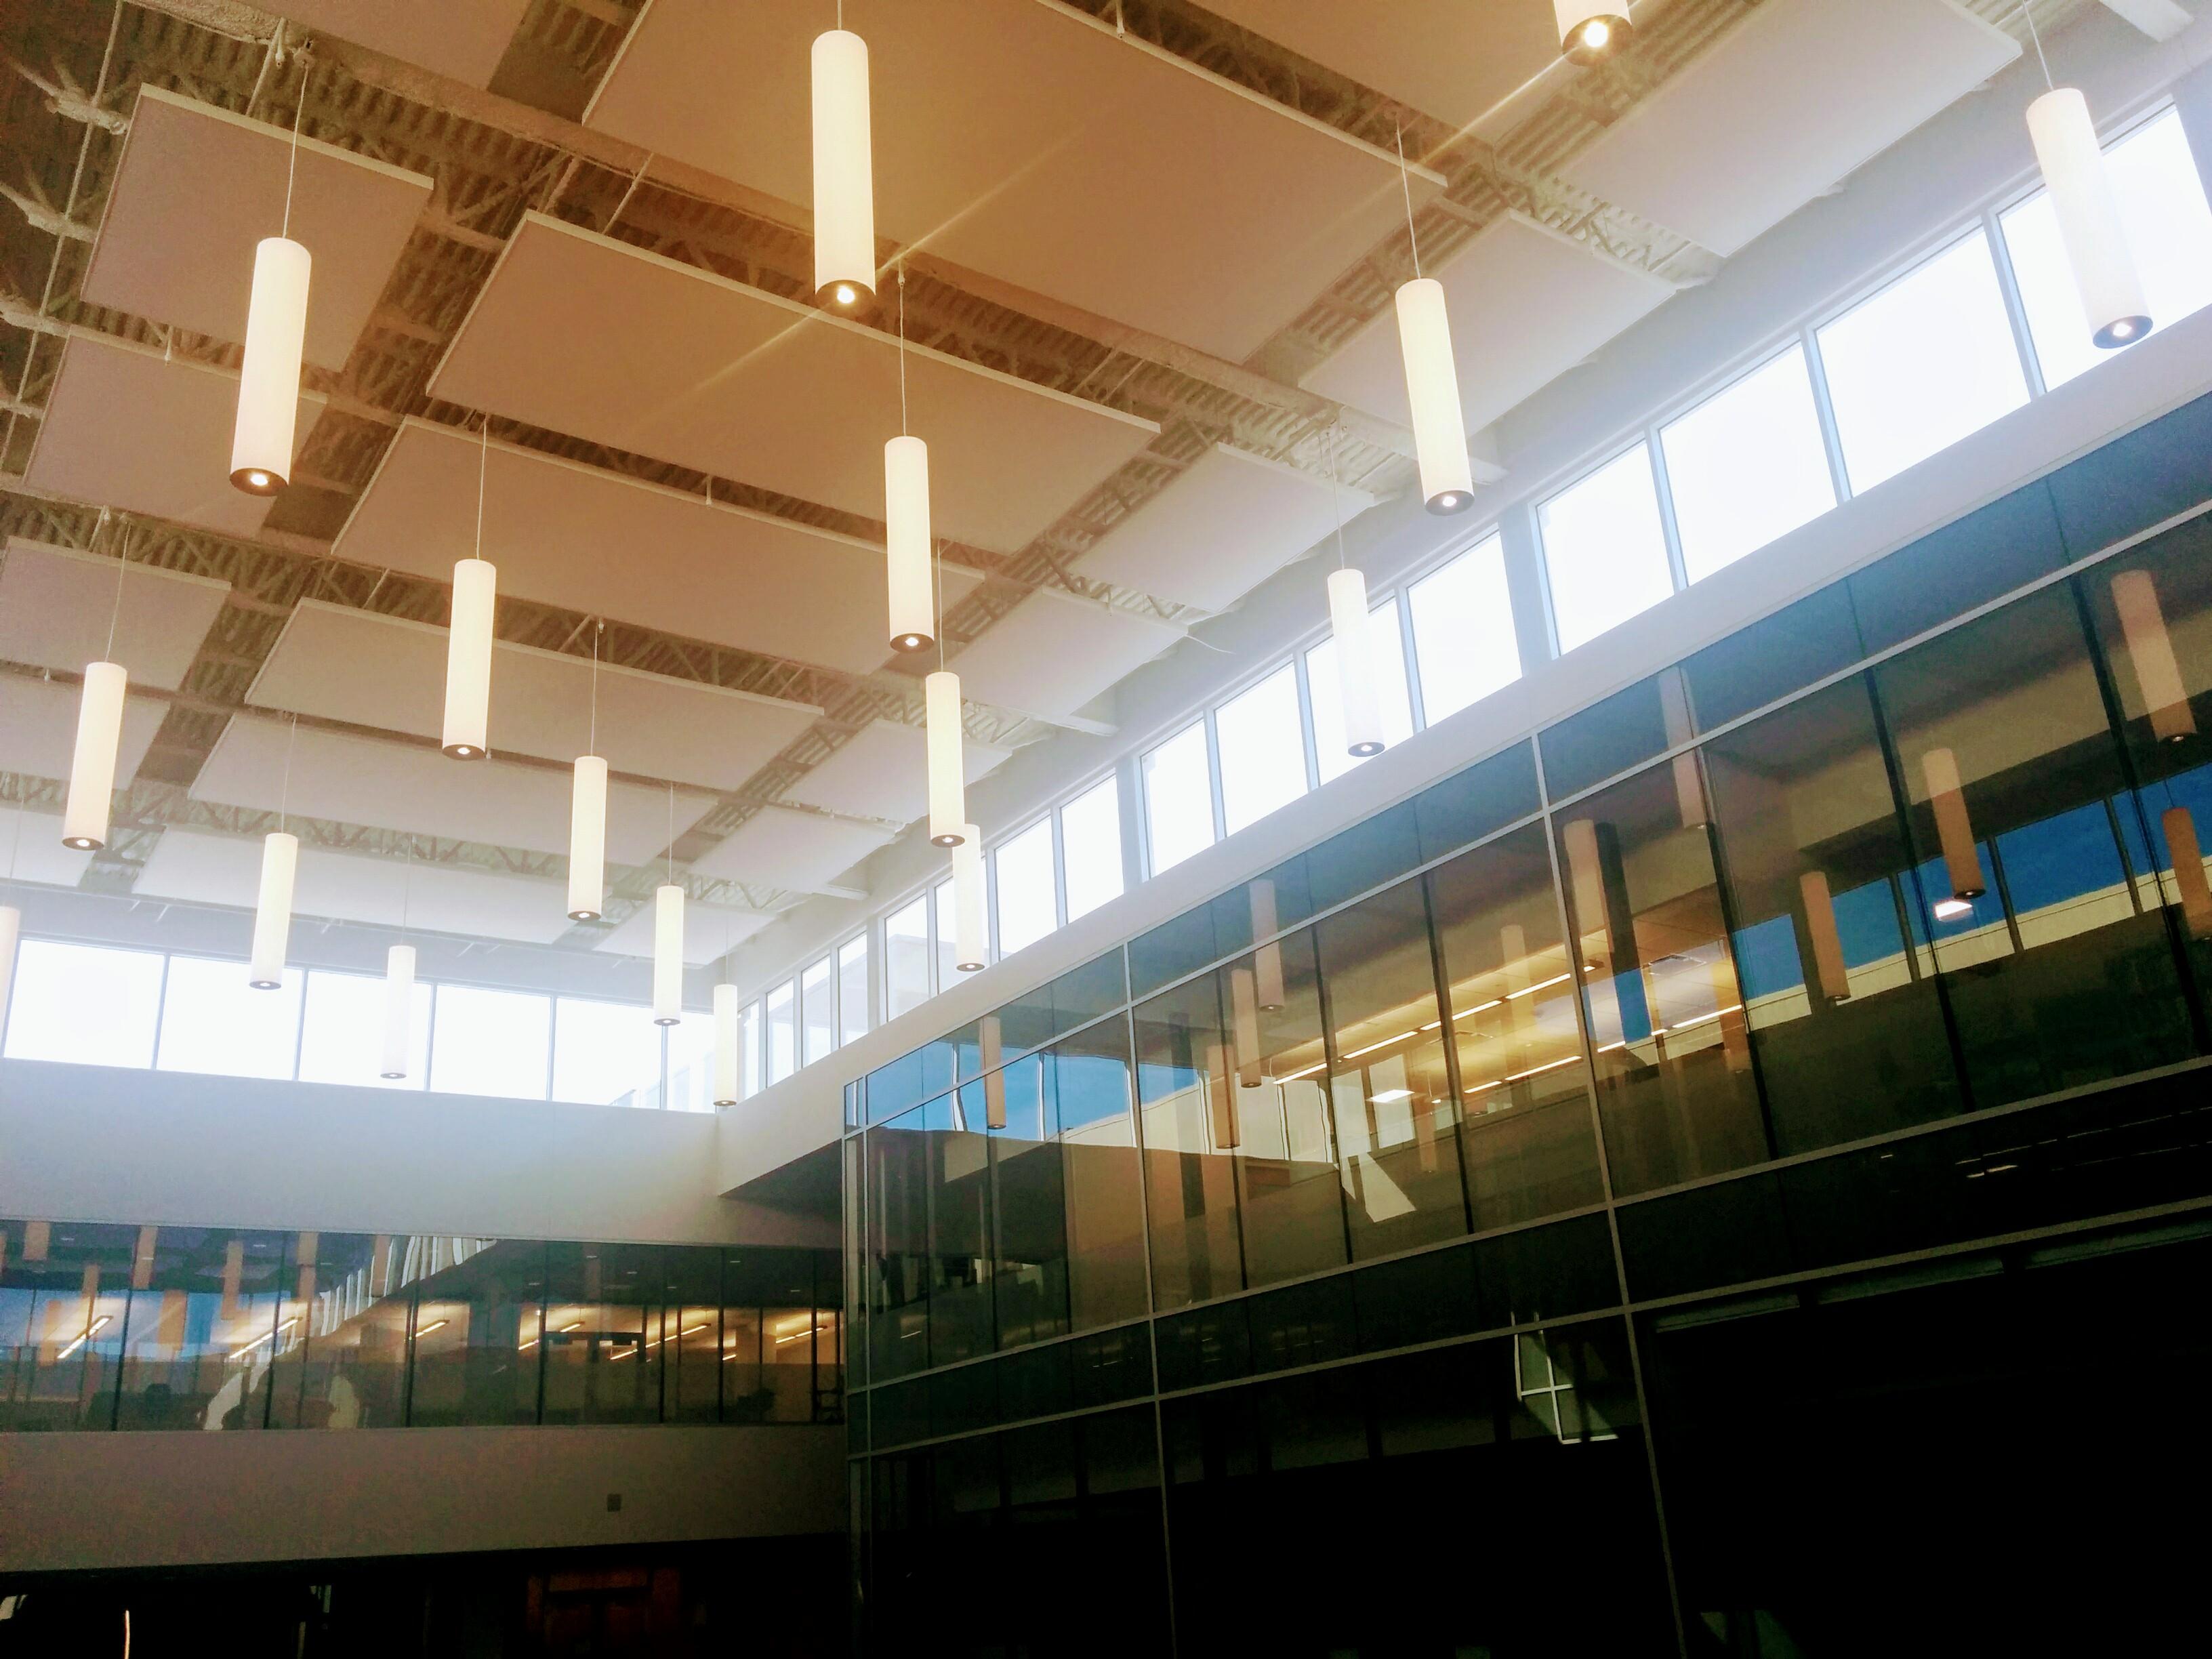 Atrium of light, looking upward